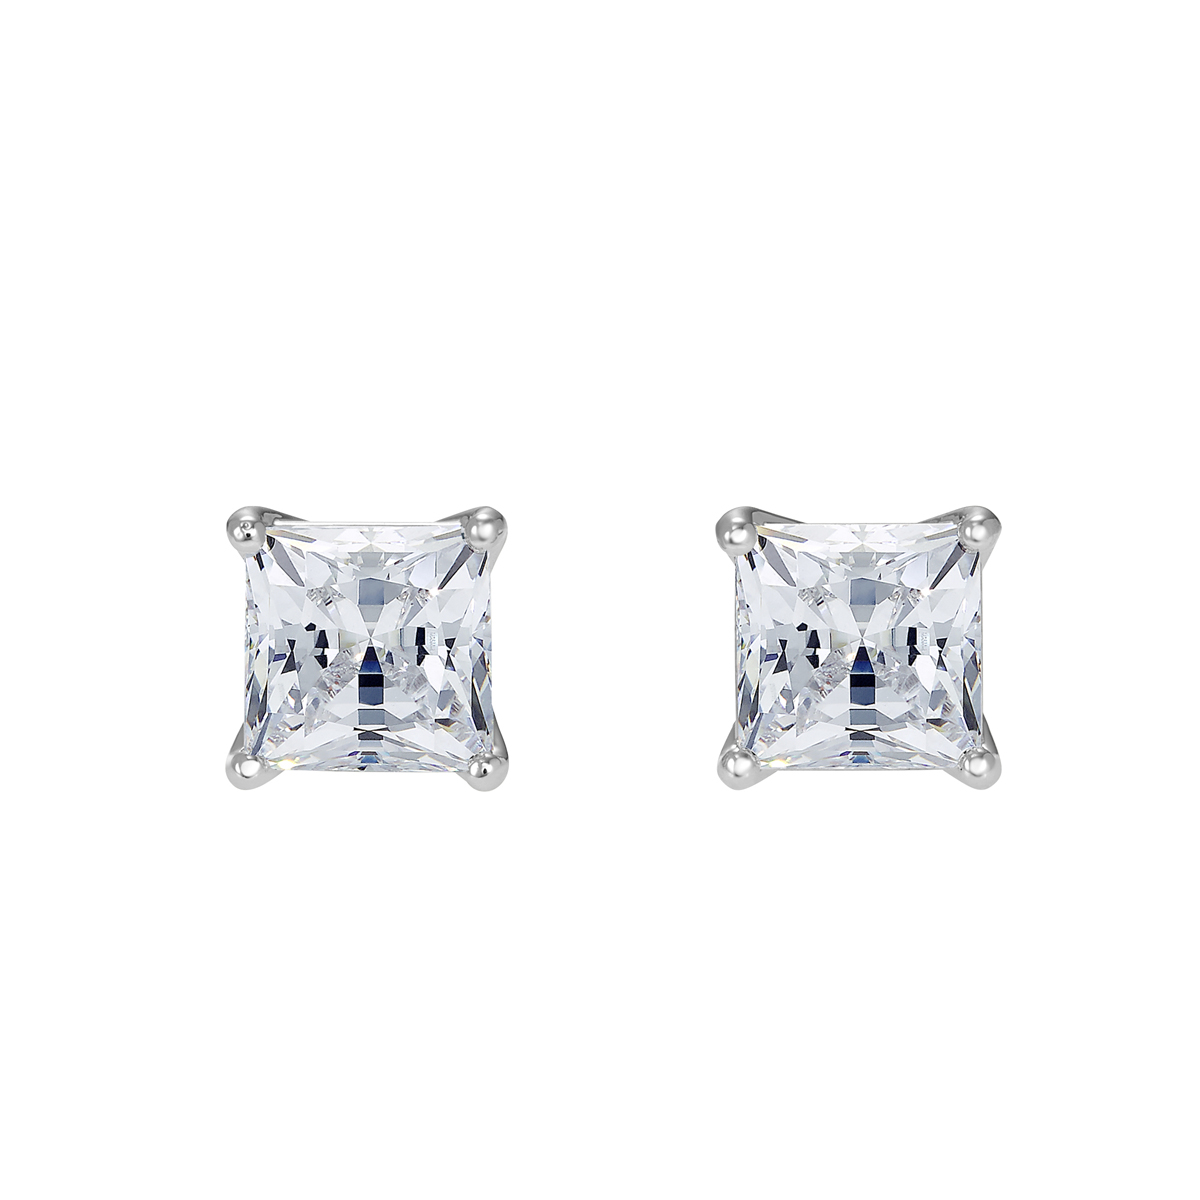 Swarovski Attract Pierced Earrings, White, Rhodium